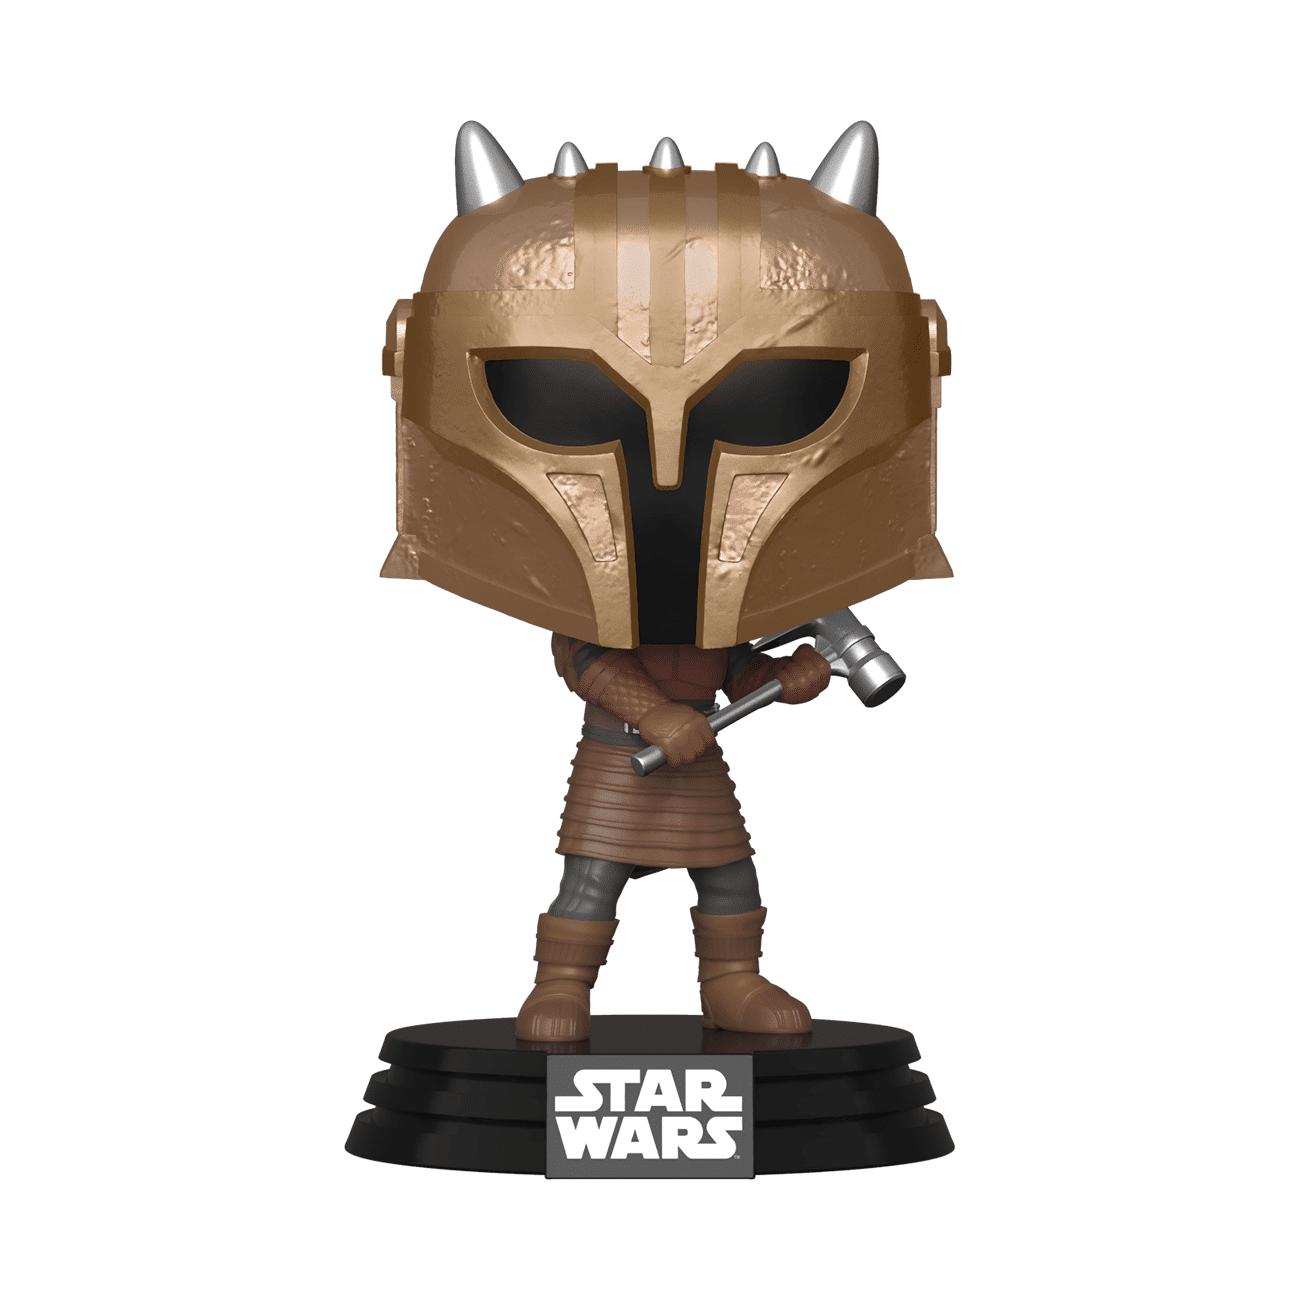 Pop! Vinyl Figurine Pop! The Armor - Star Wars: The Mandalorian